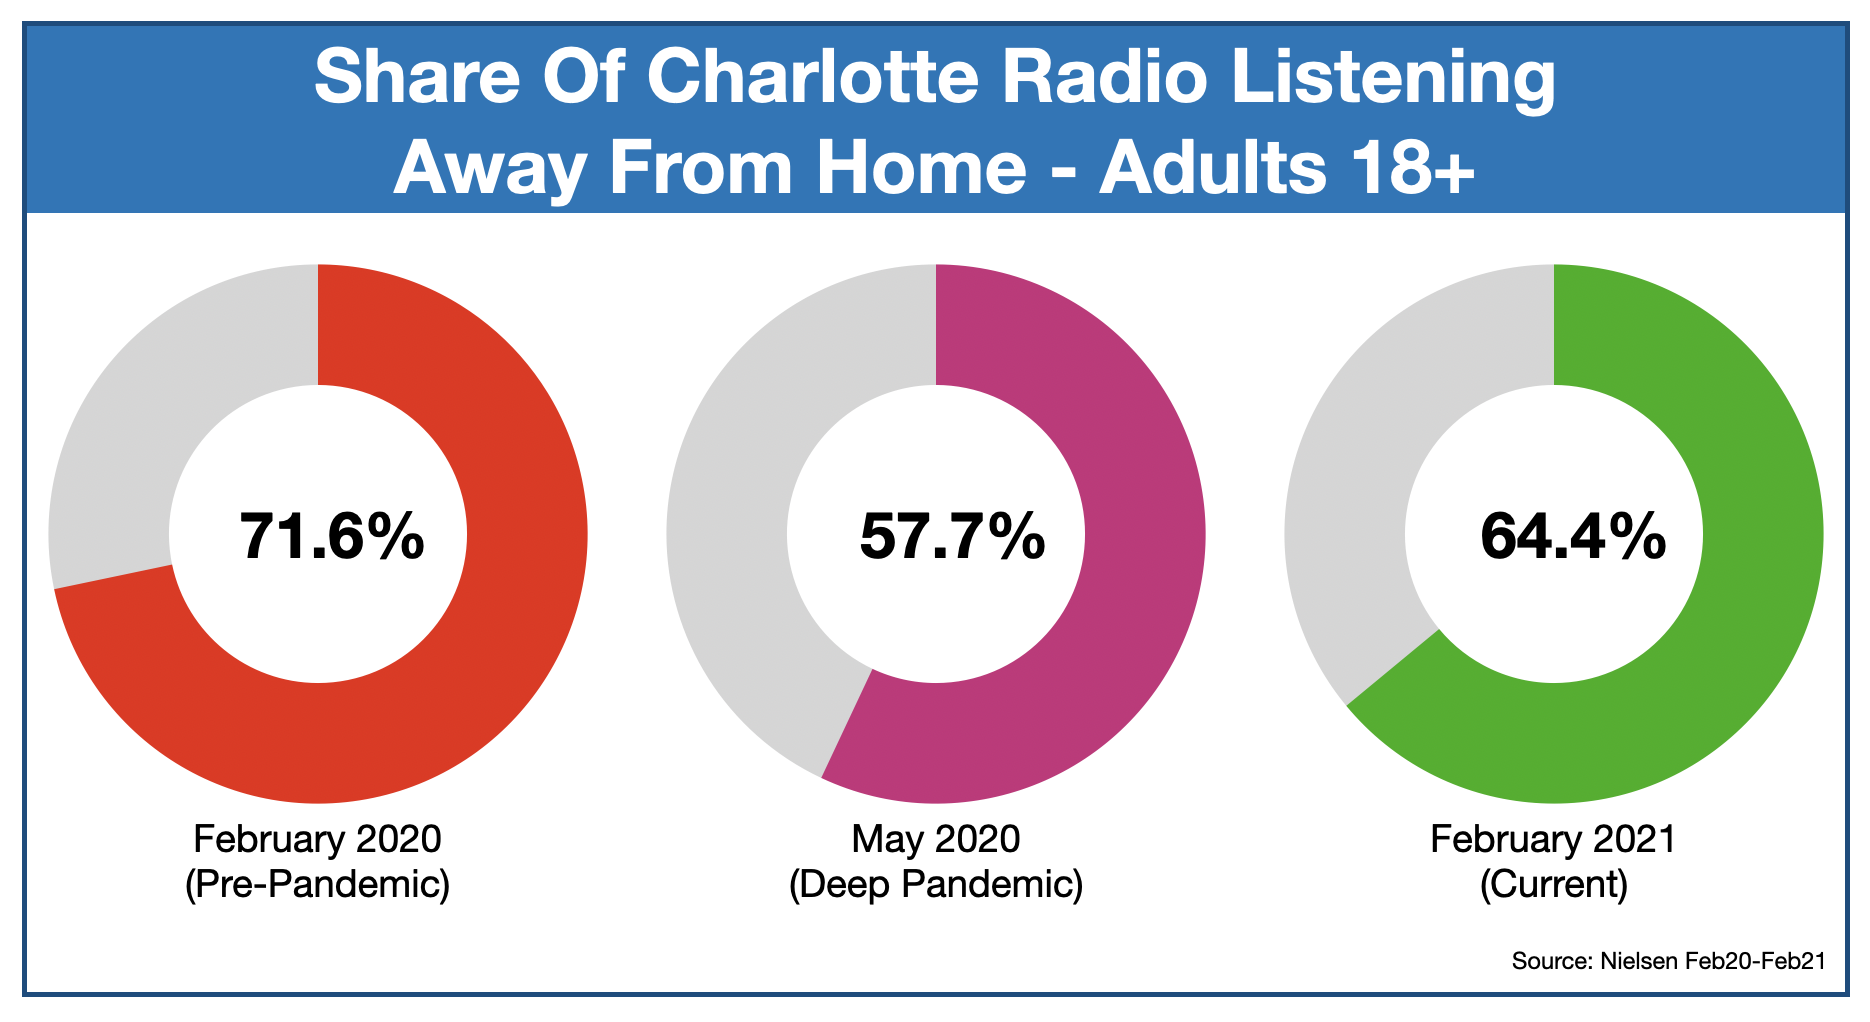 Charlotte Radio Listening Locations